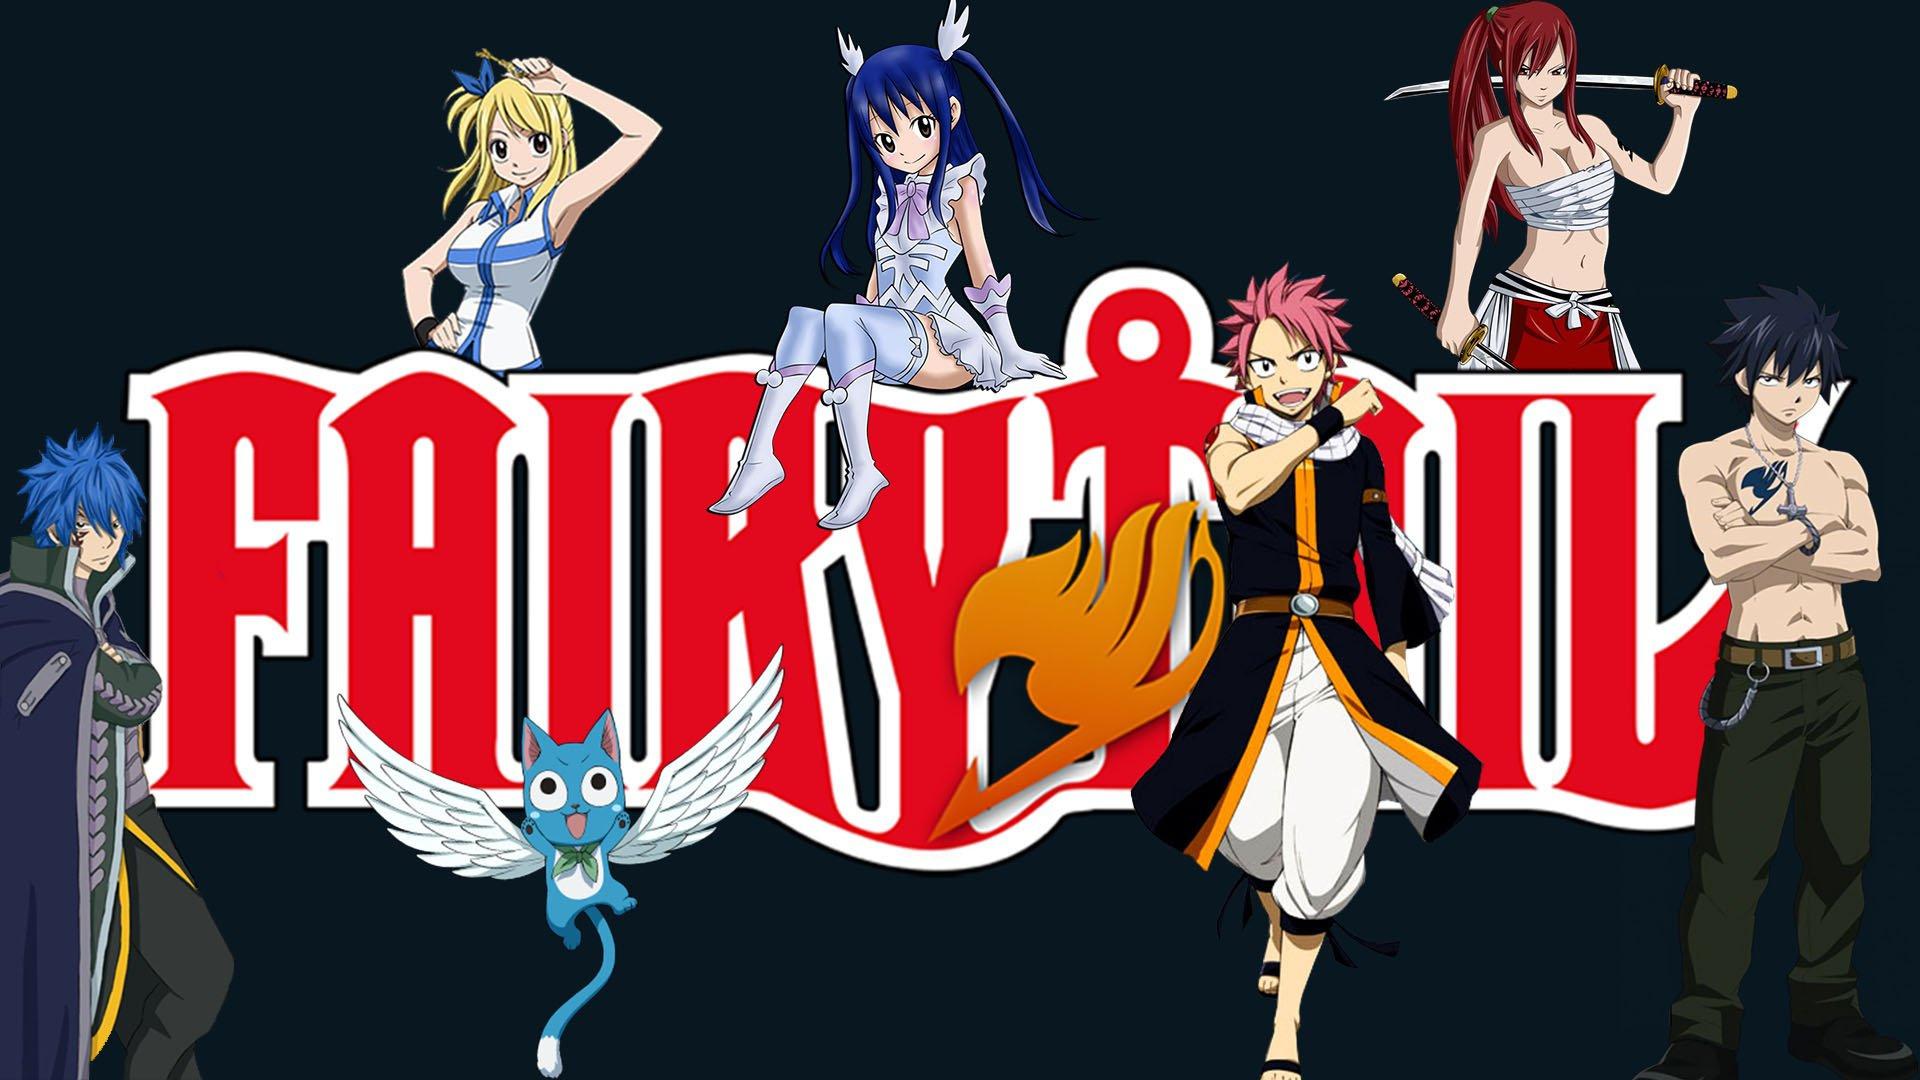 Anime Loading Screens Pack Gta5 Modscom